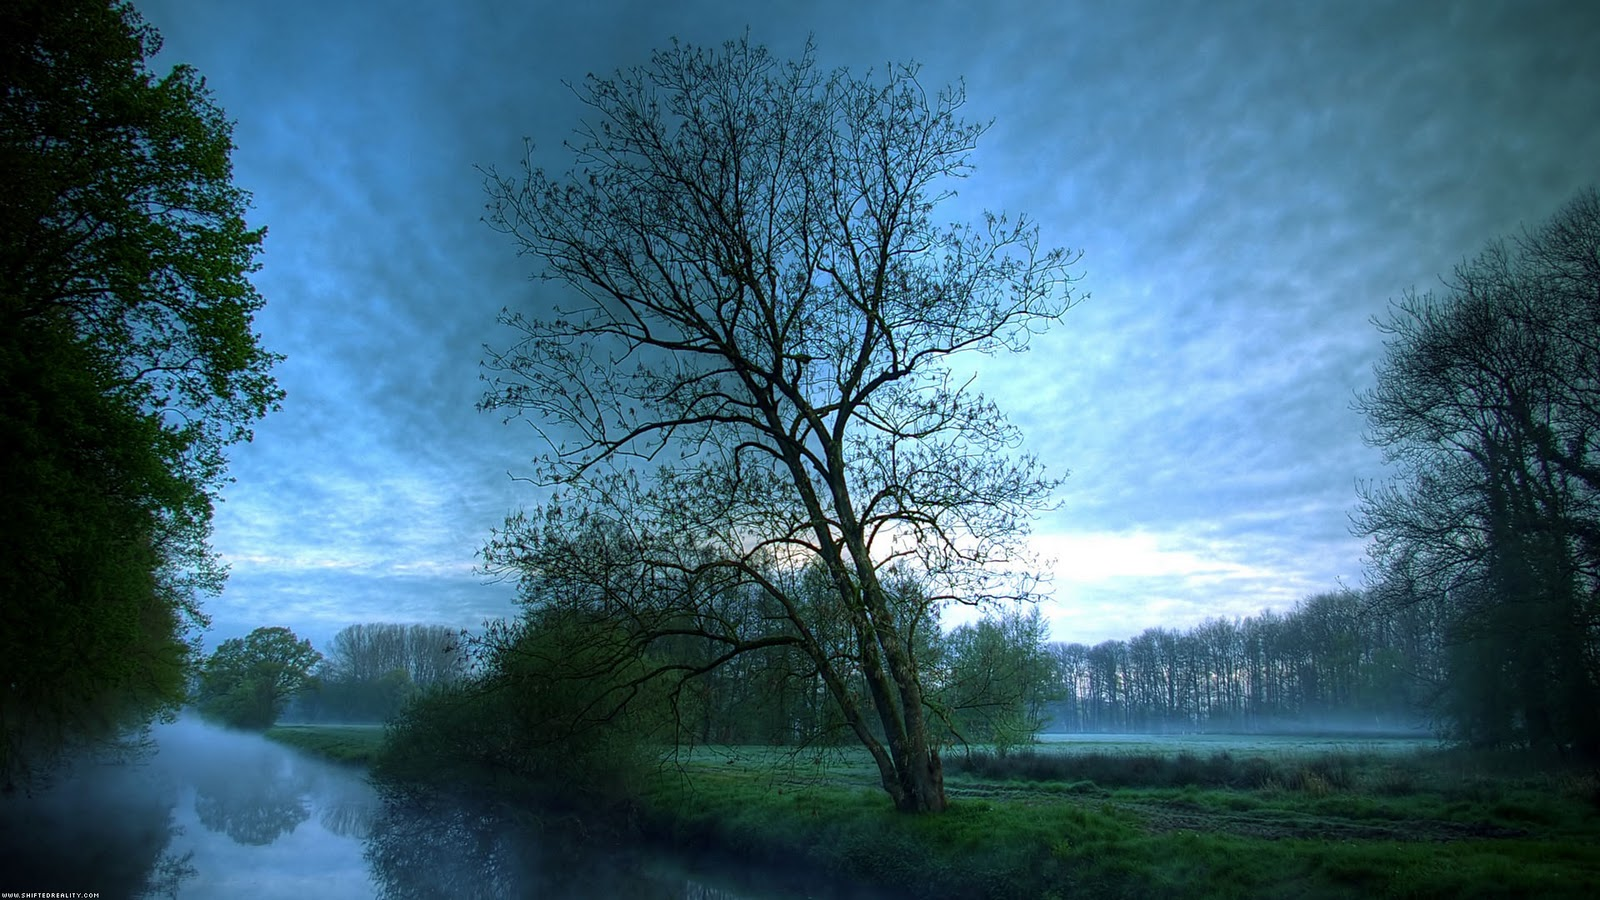 Nature Wallpaper HD 1080p